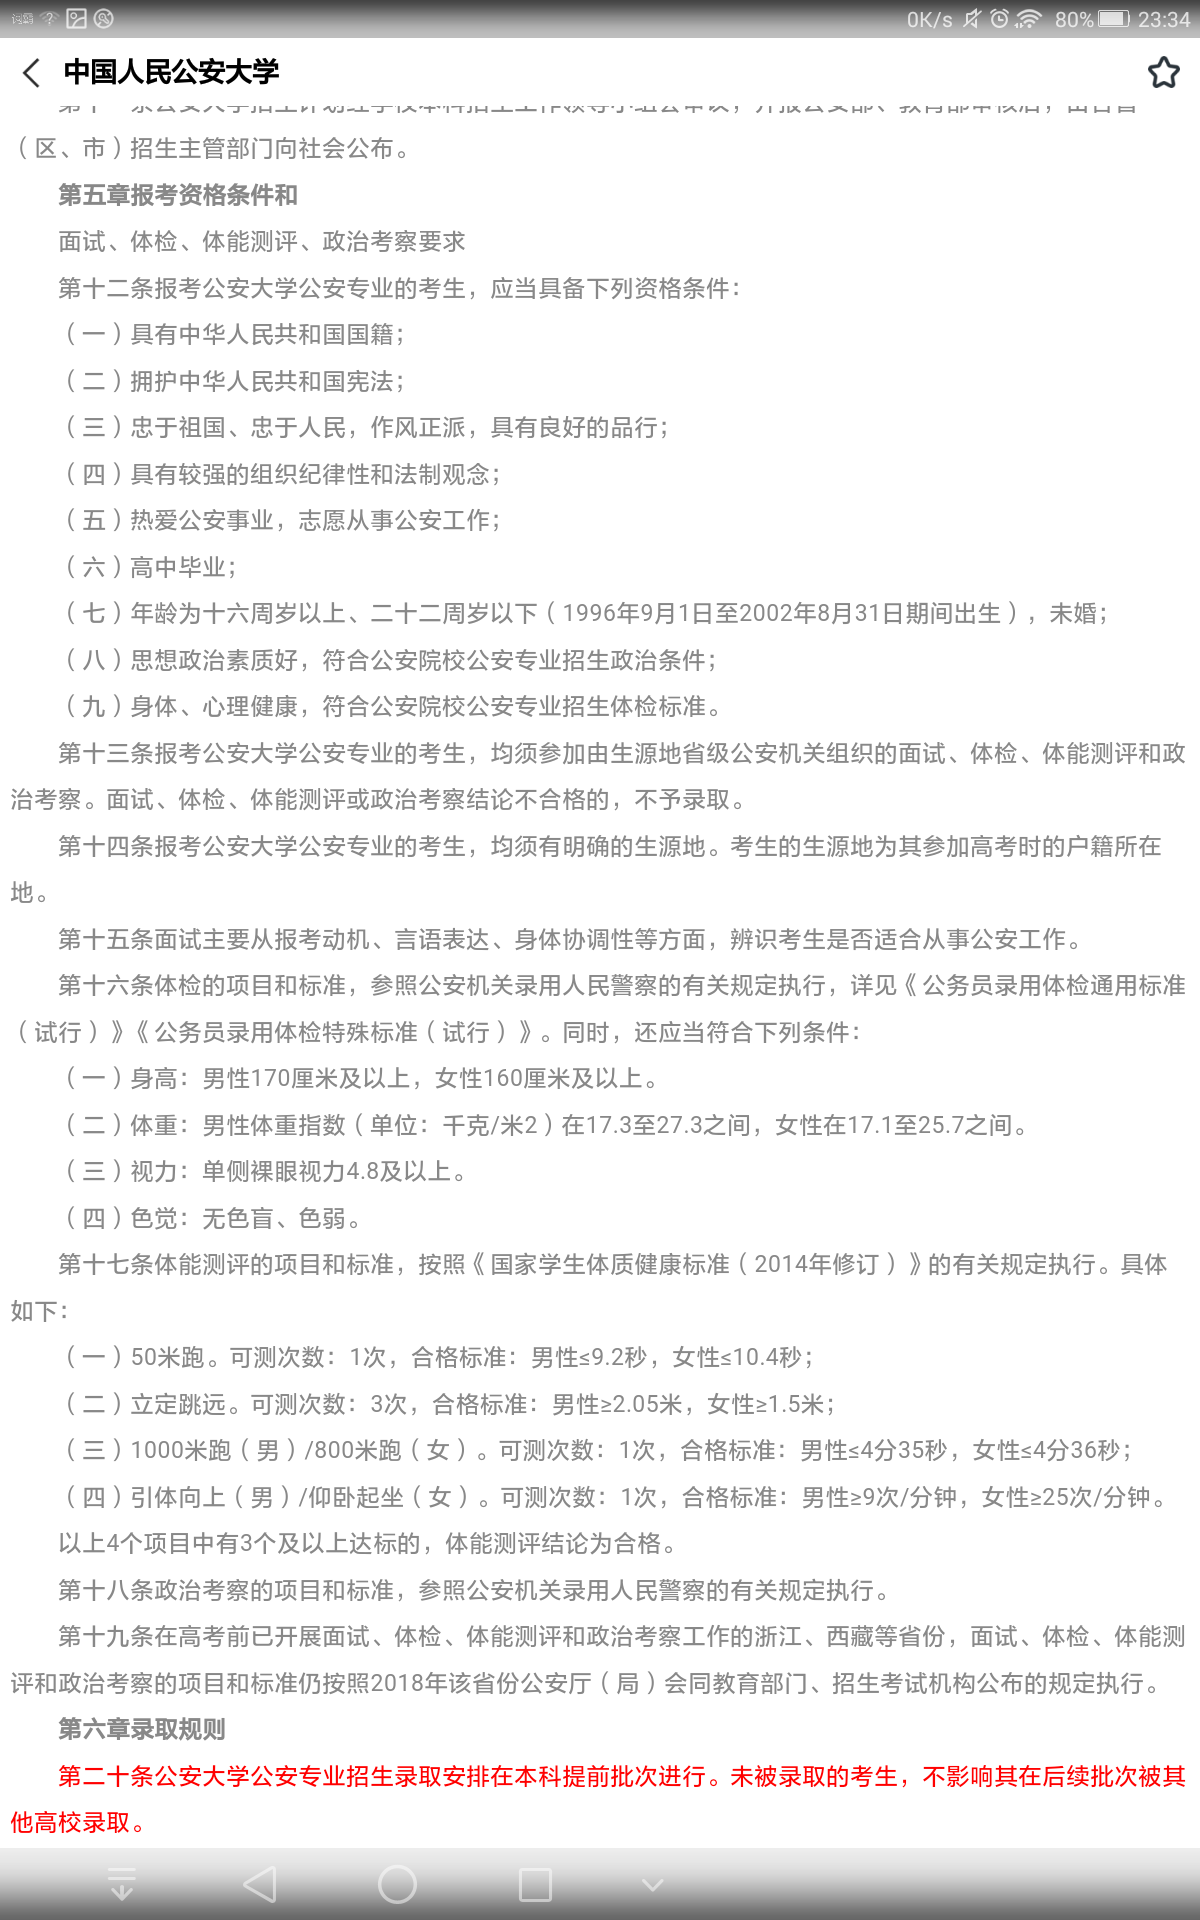 Screenshot_2019-01-25-23-34-46.png